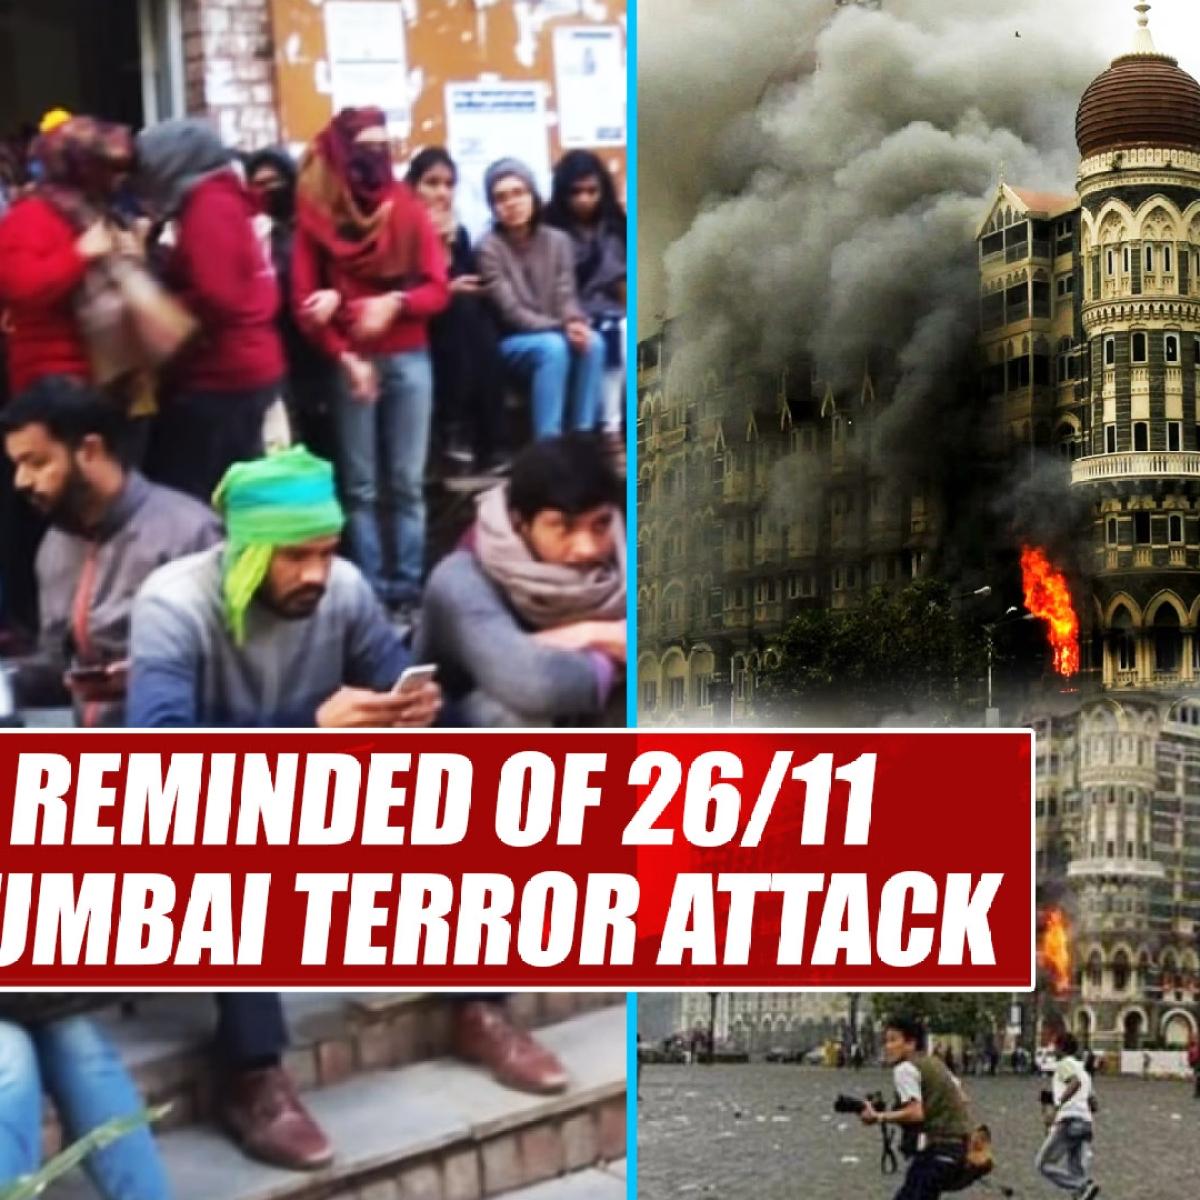 Reminded of 26/11 Mumbai terror attack: Uddhav Thackeray on JNU violence